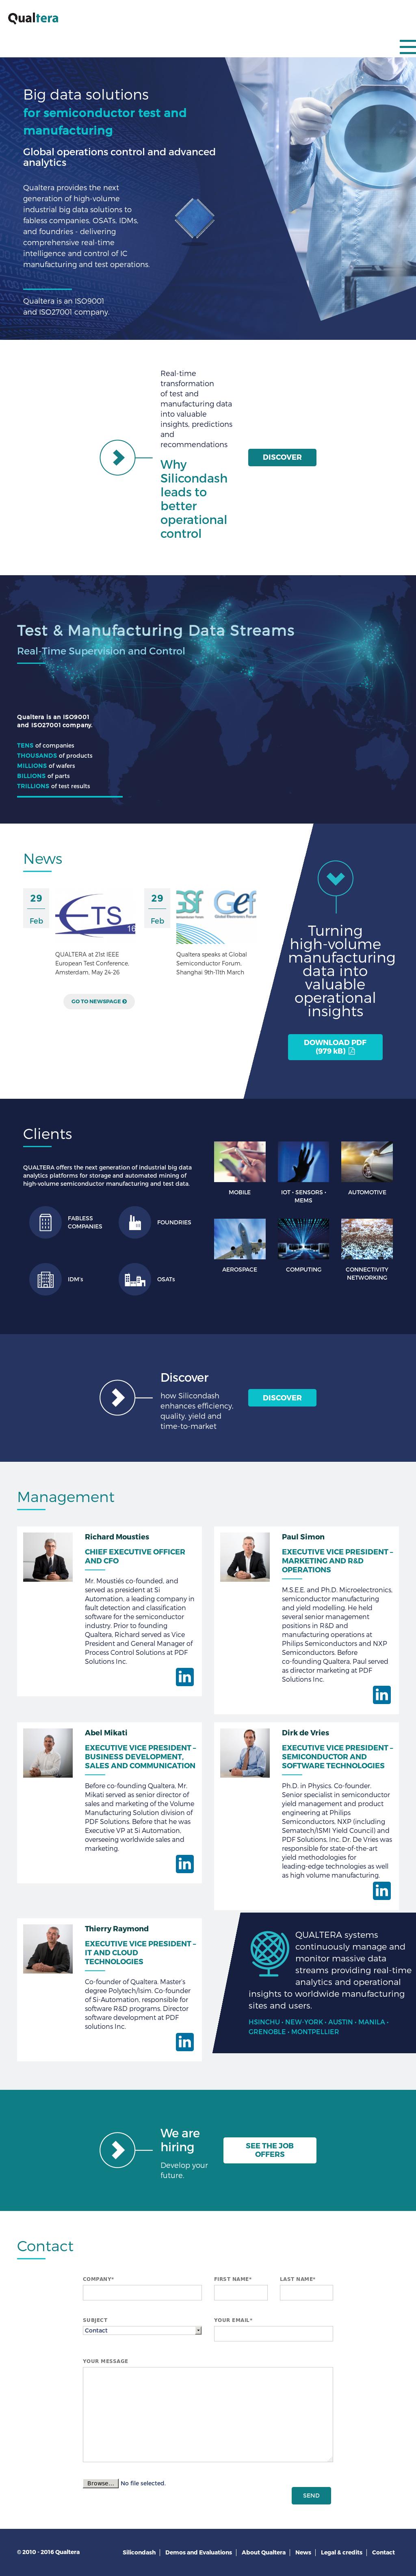 Qualtera Competitors, Revenue and Employees - Owler Company Profile